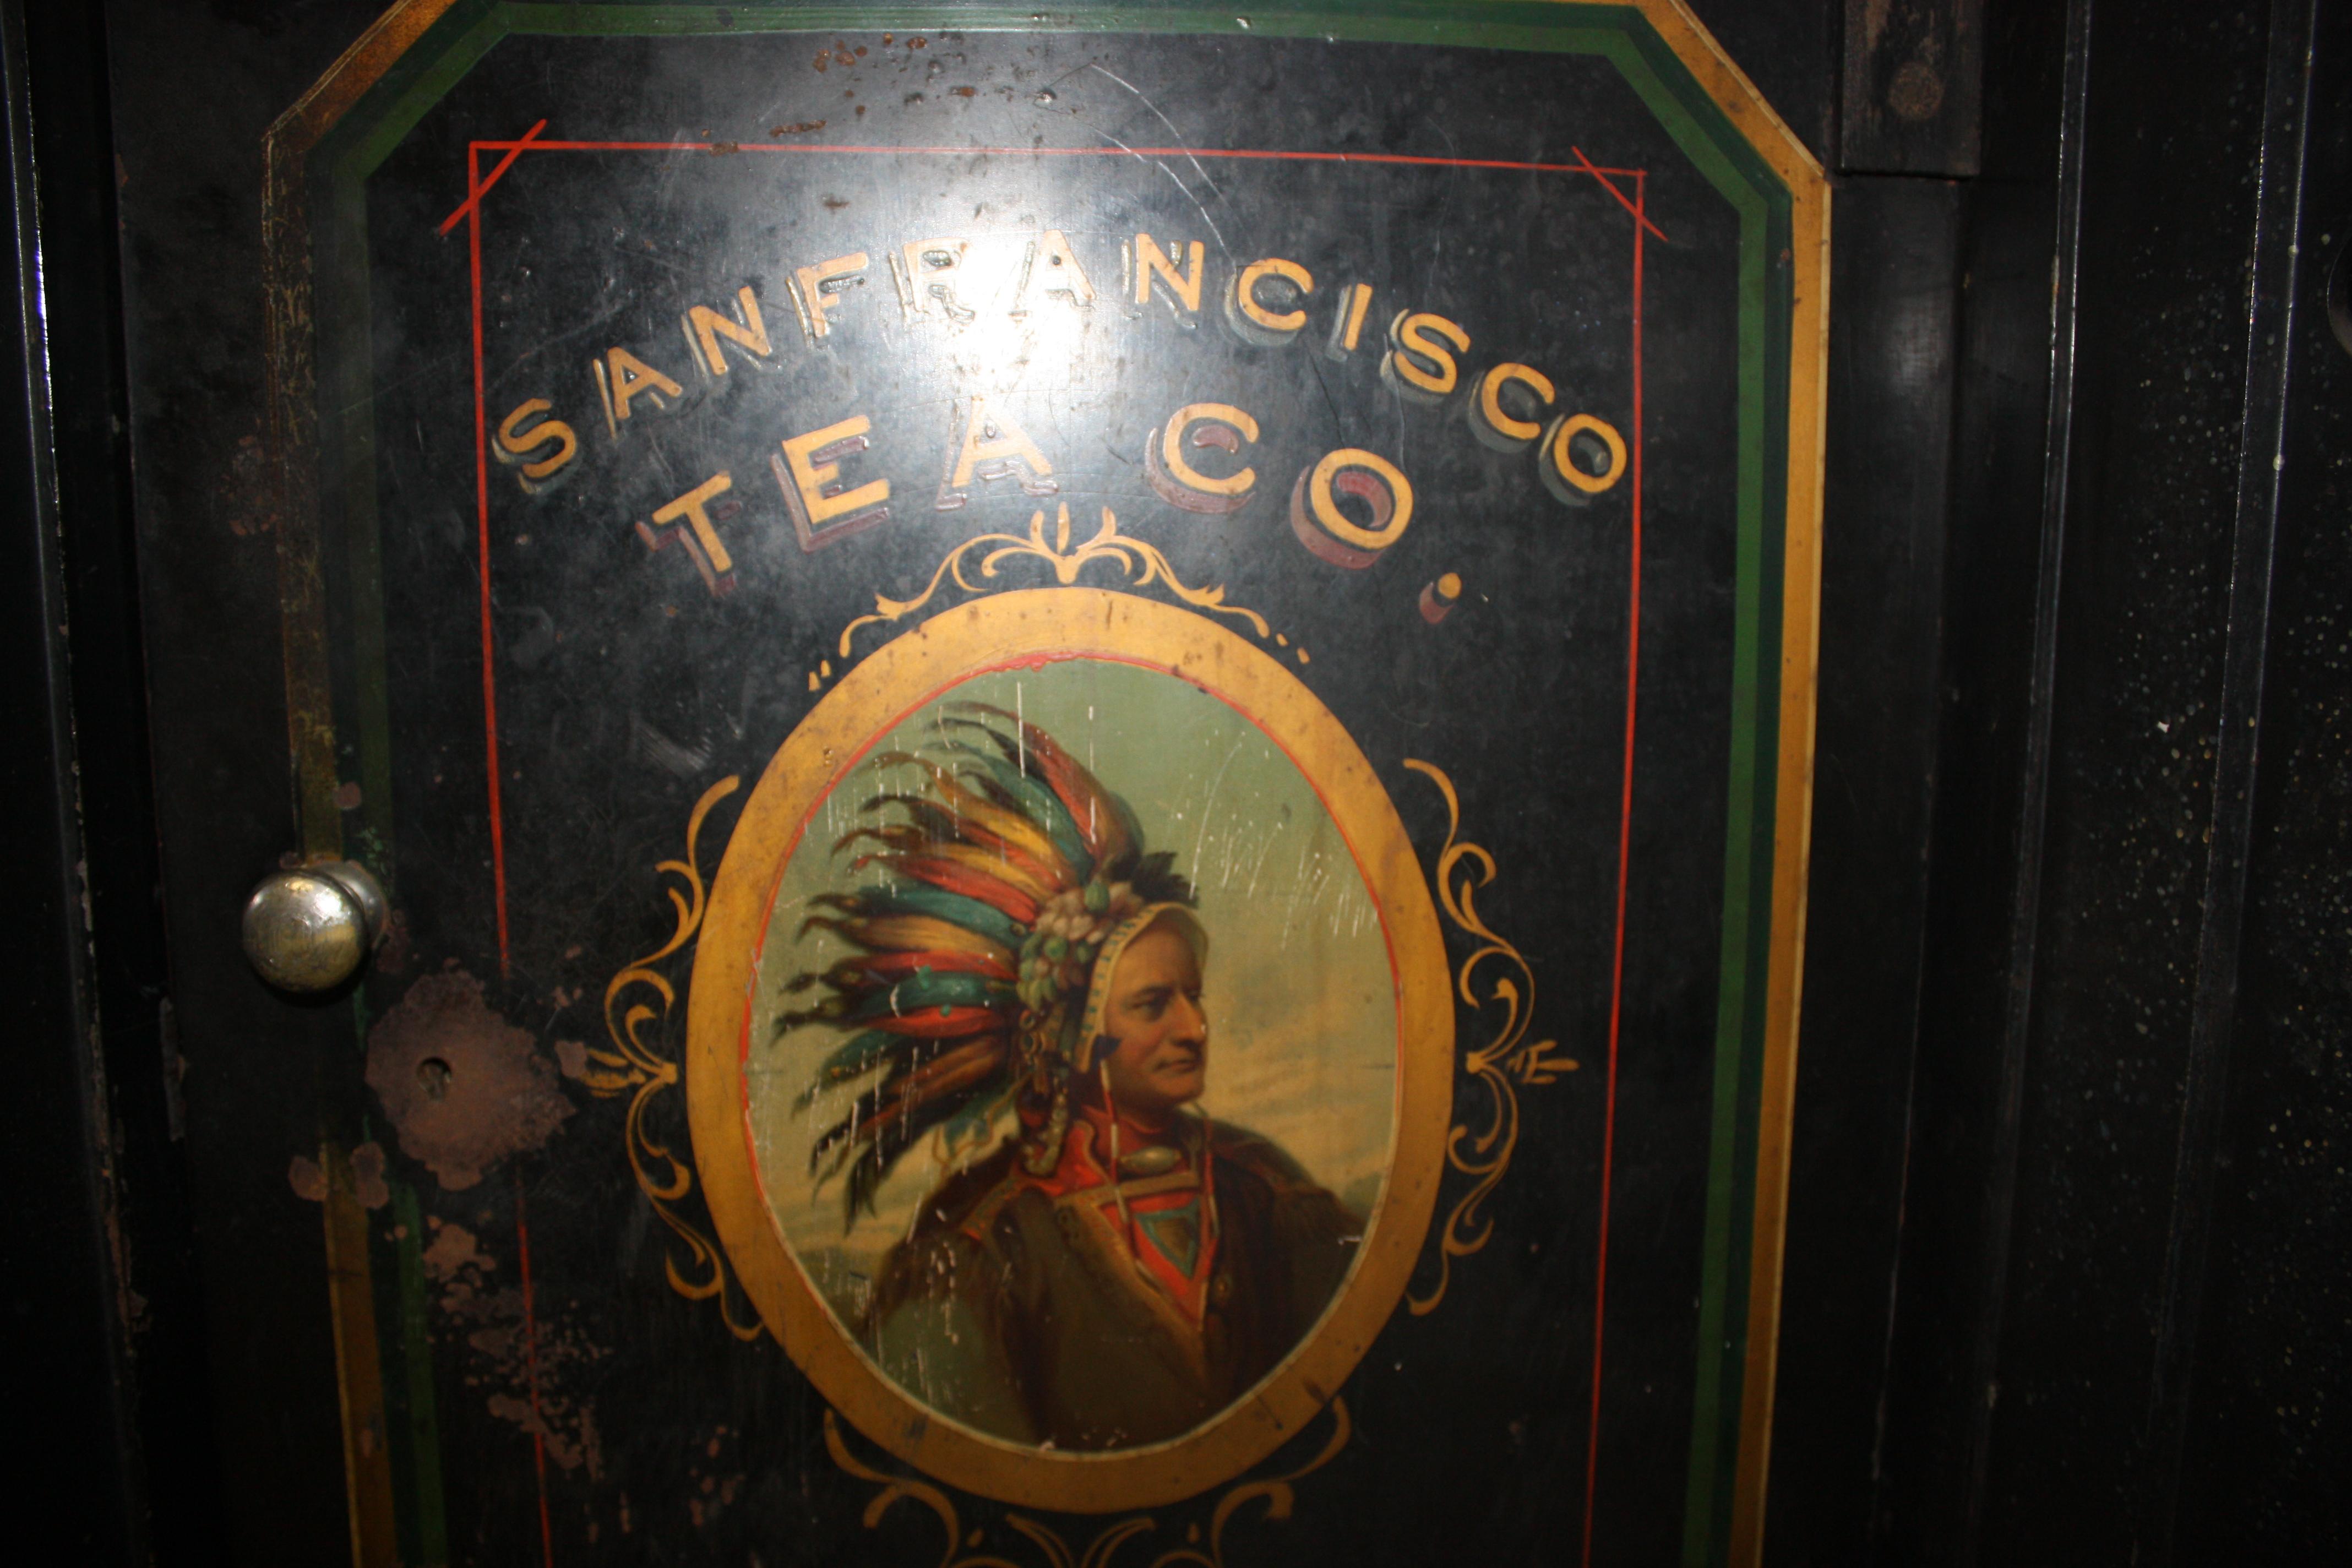 Antique Safes San Francisco Tea Company Tom Ziemer